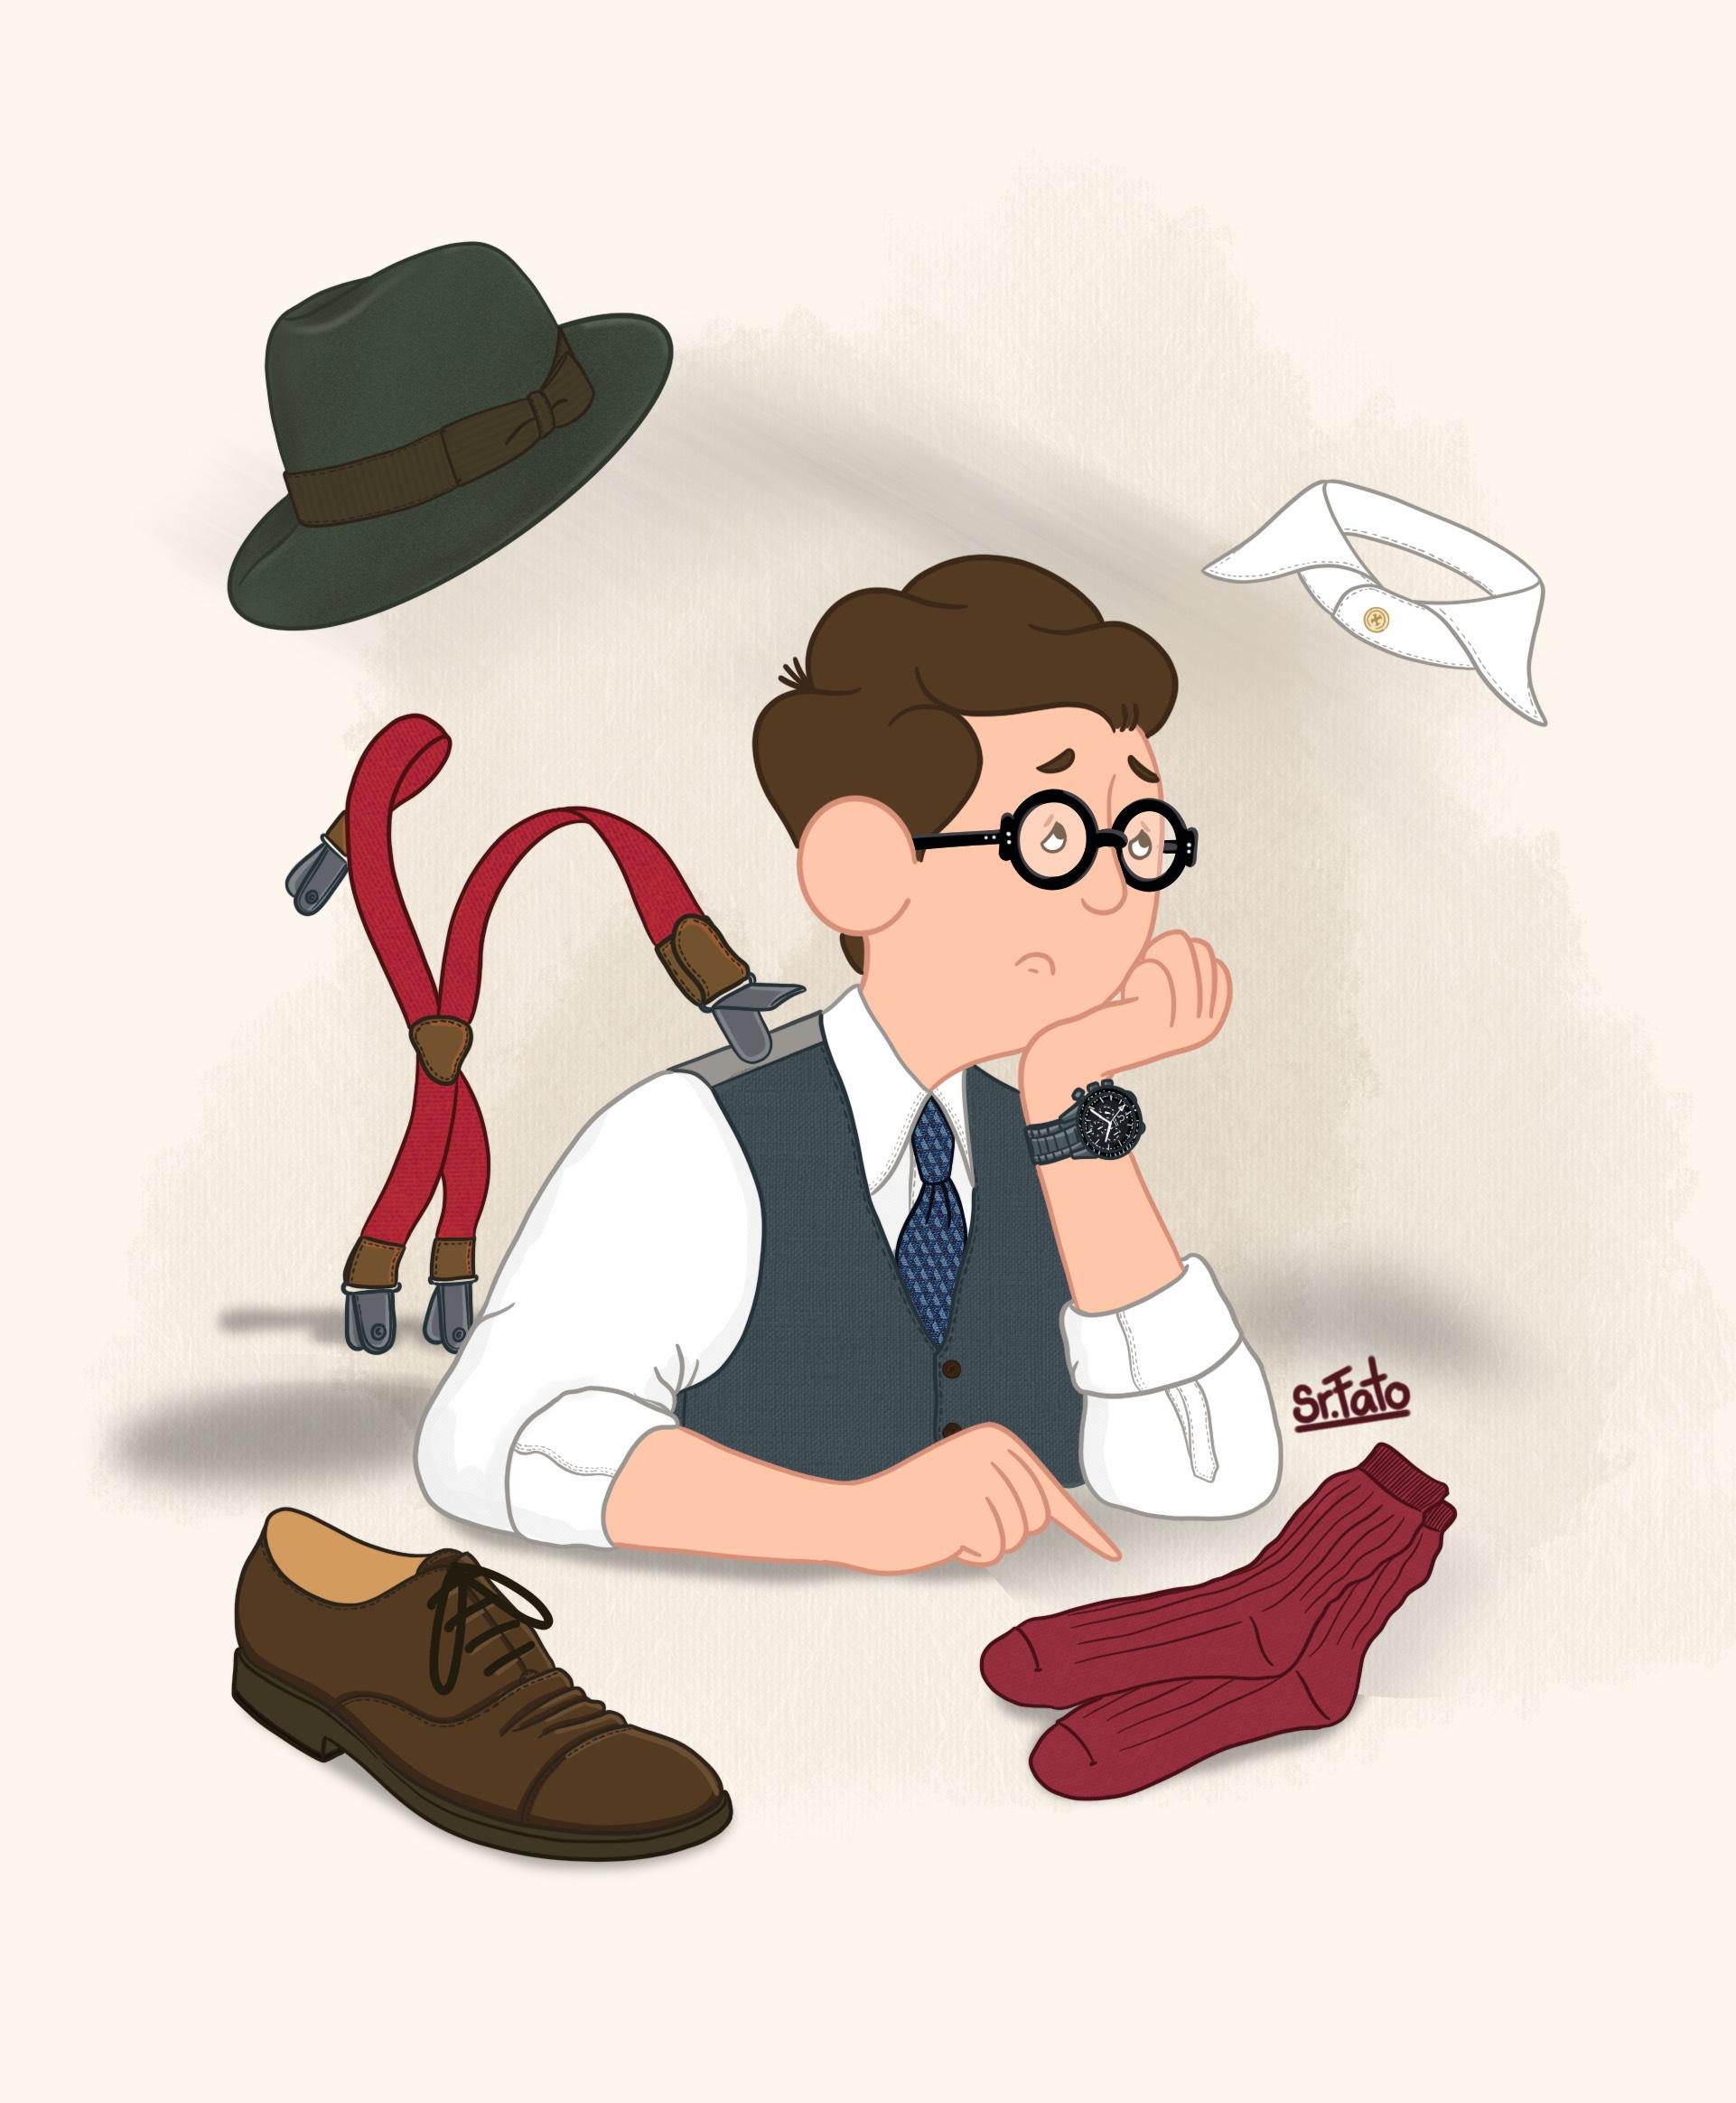 Problemas de quem veste como gentleman